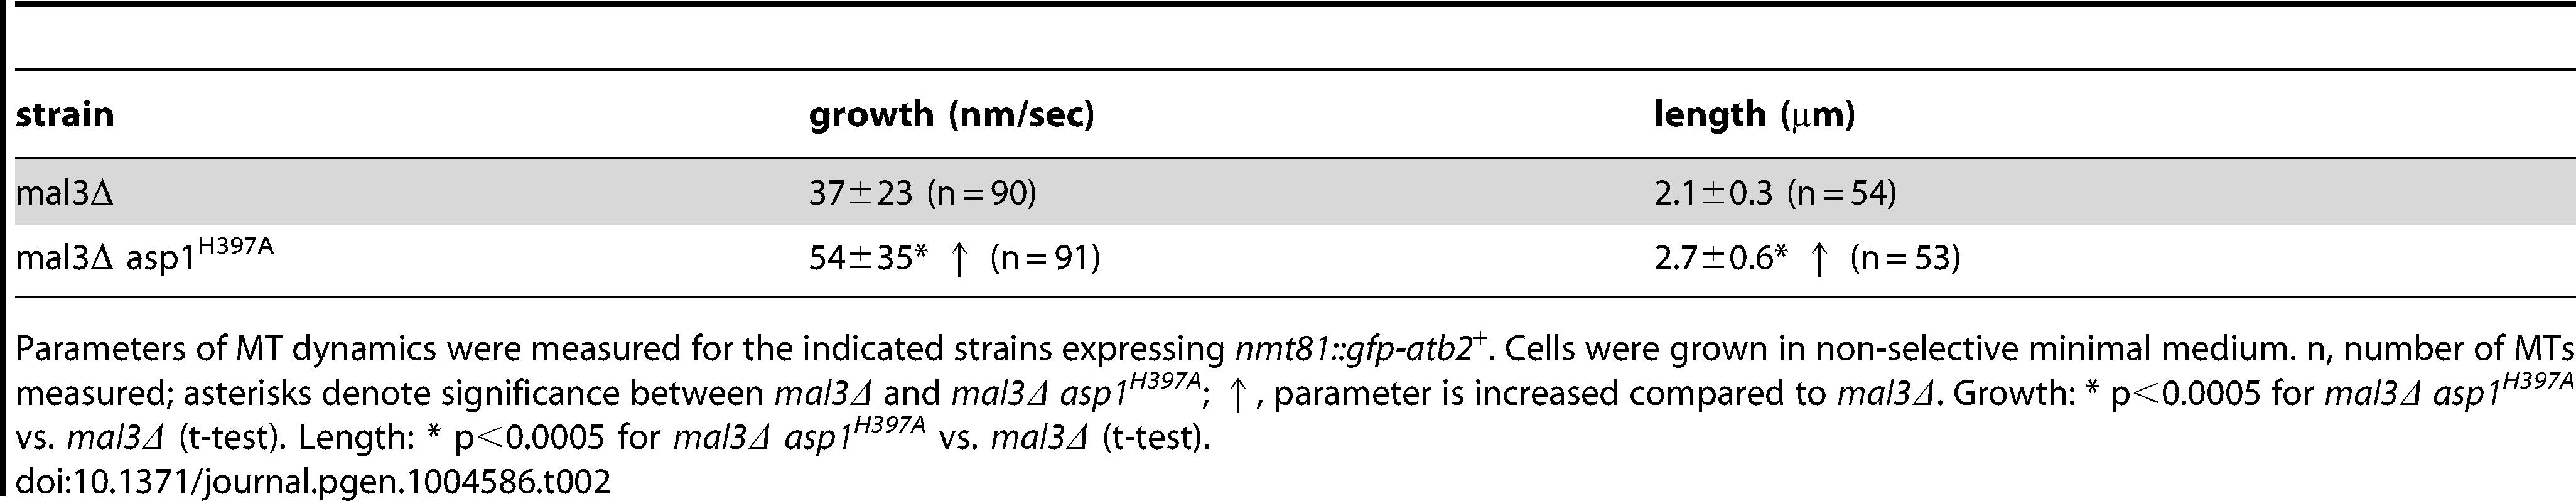 Interphase MT dynamics in <i>mal3Δ</i> variant strains.